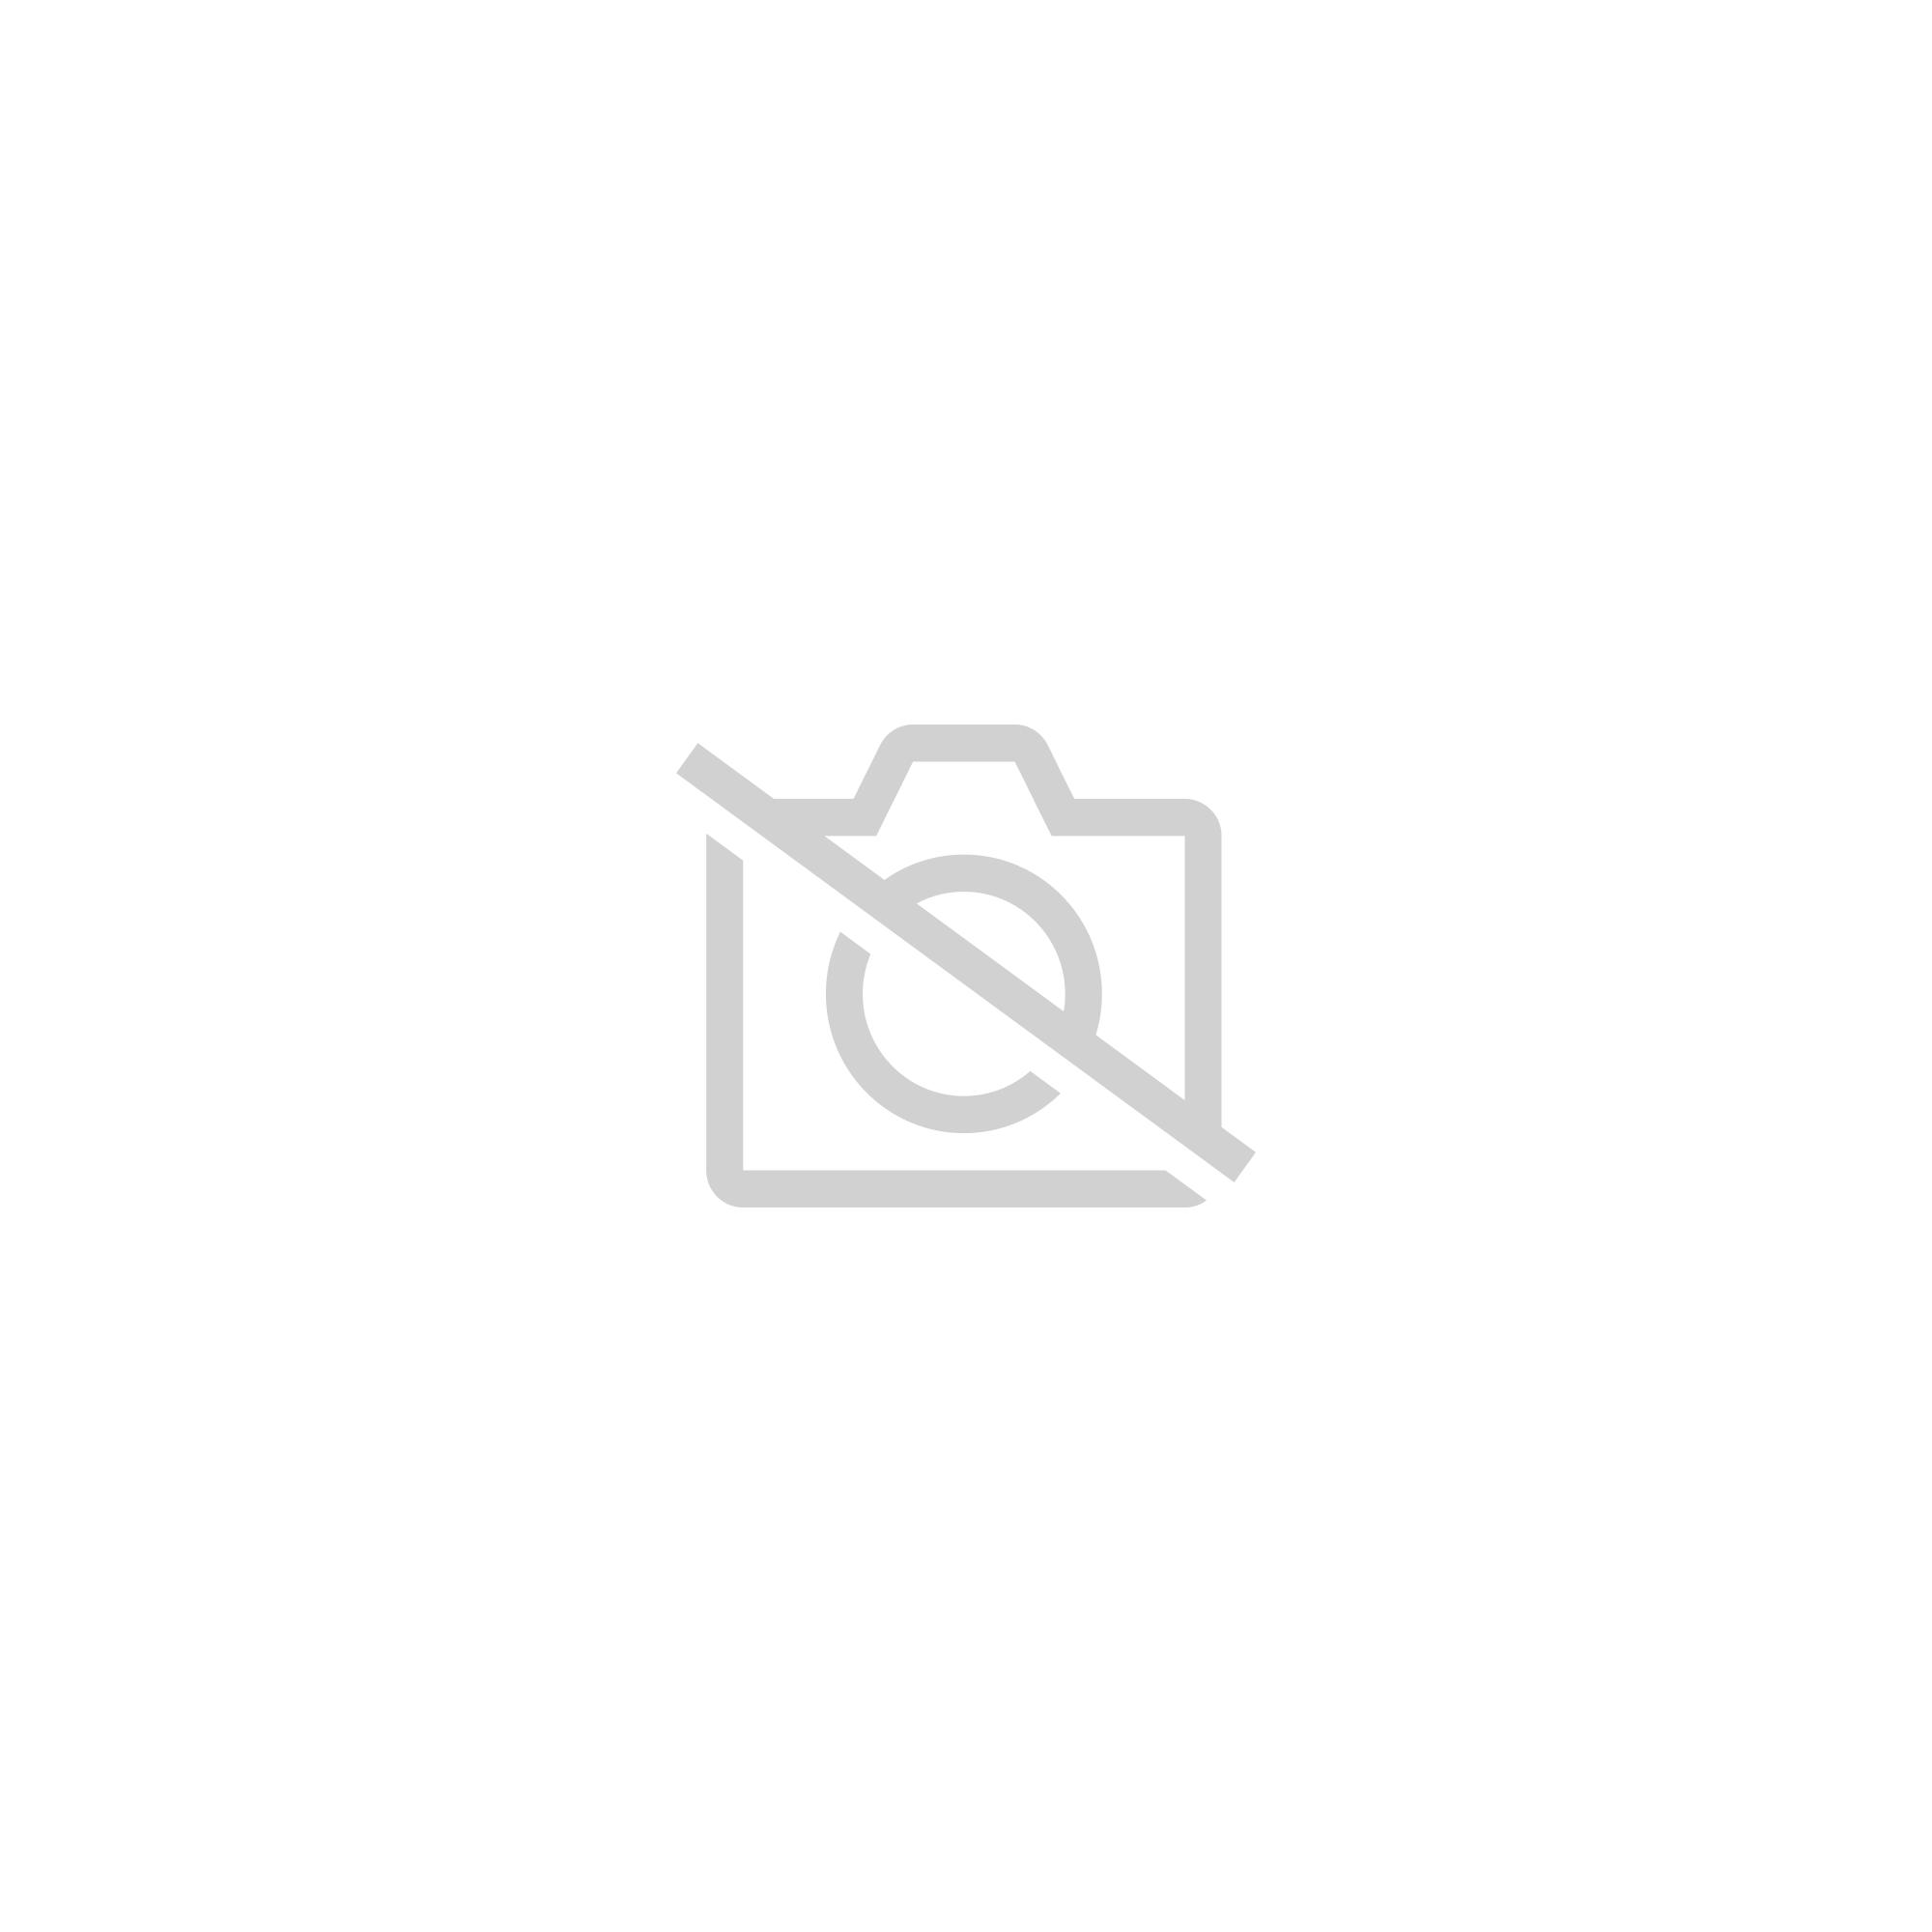 Alberto Magnelli - Collages & Ardoises de Marcelin PLEYNET